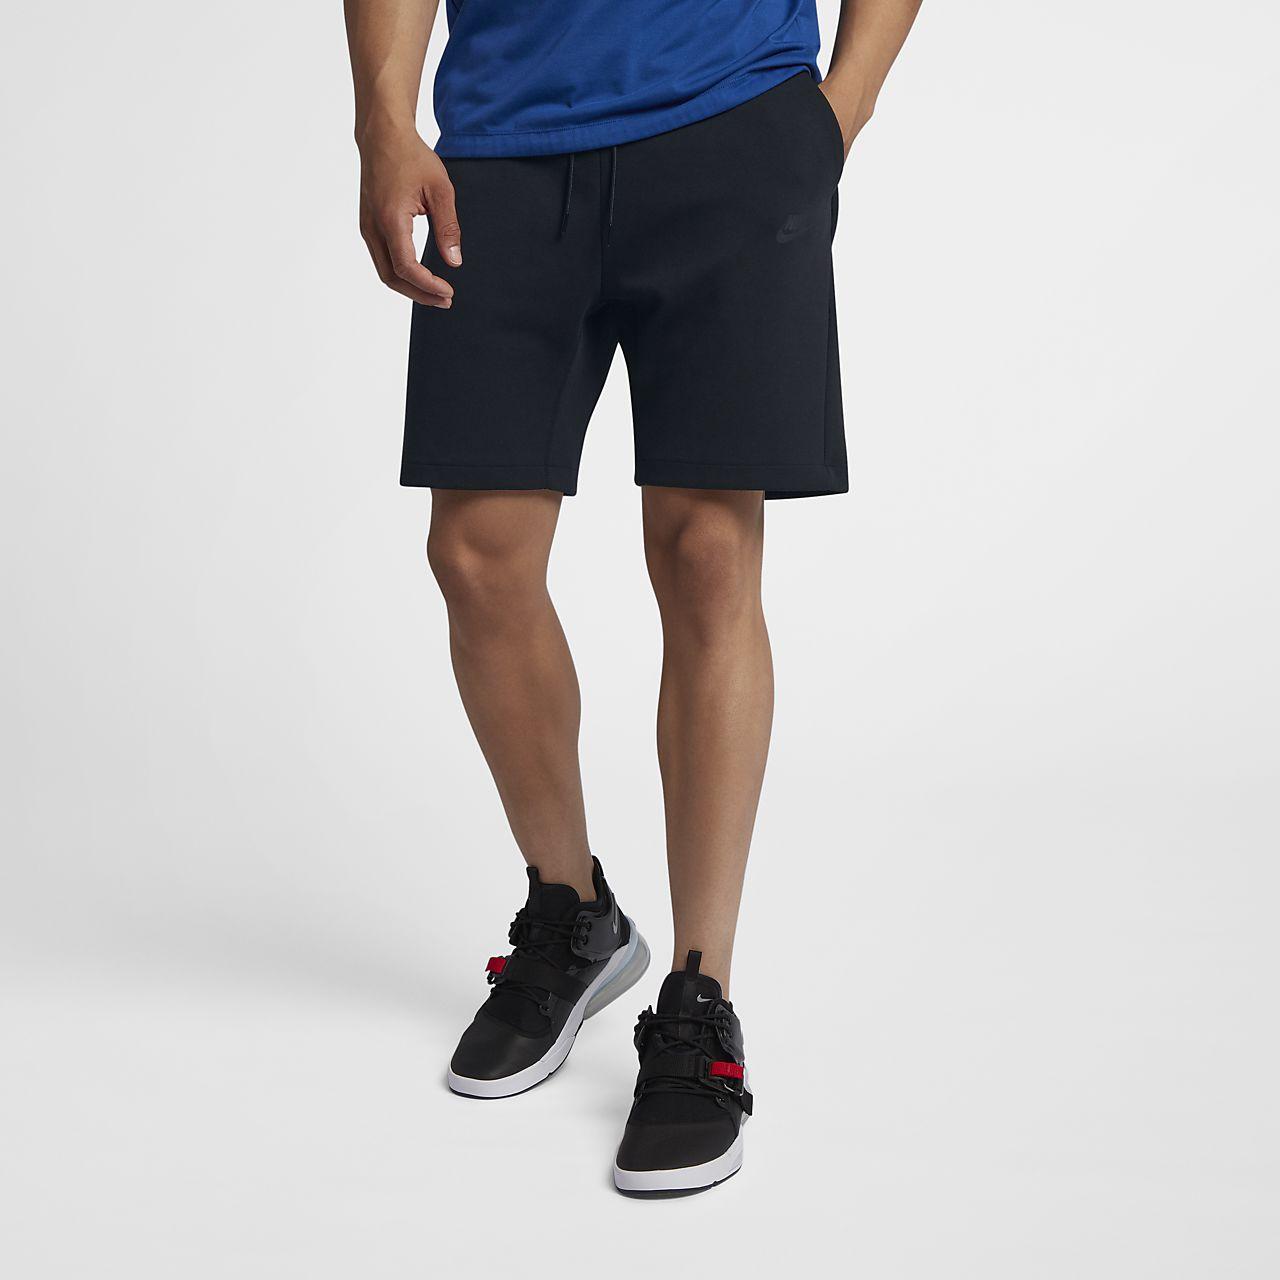 Nike Tech Fleece SchwarzSchwarzSchwarzSchwarz  Shorts